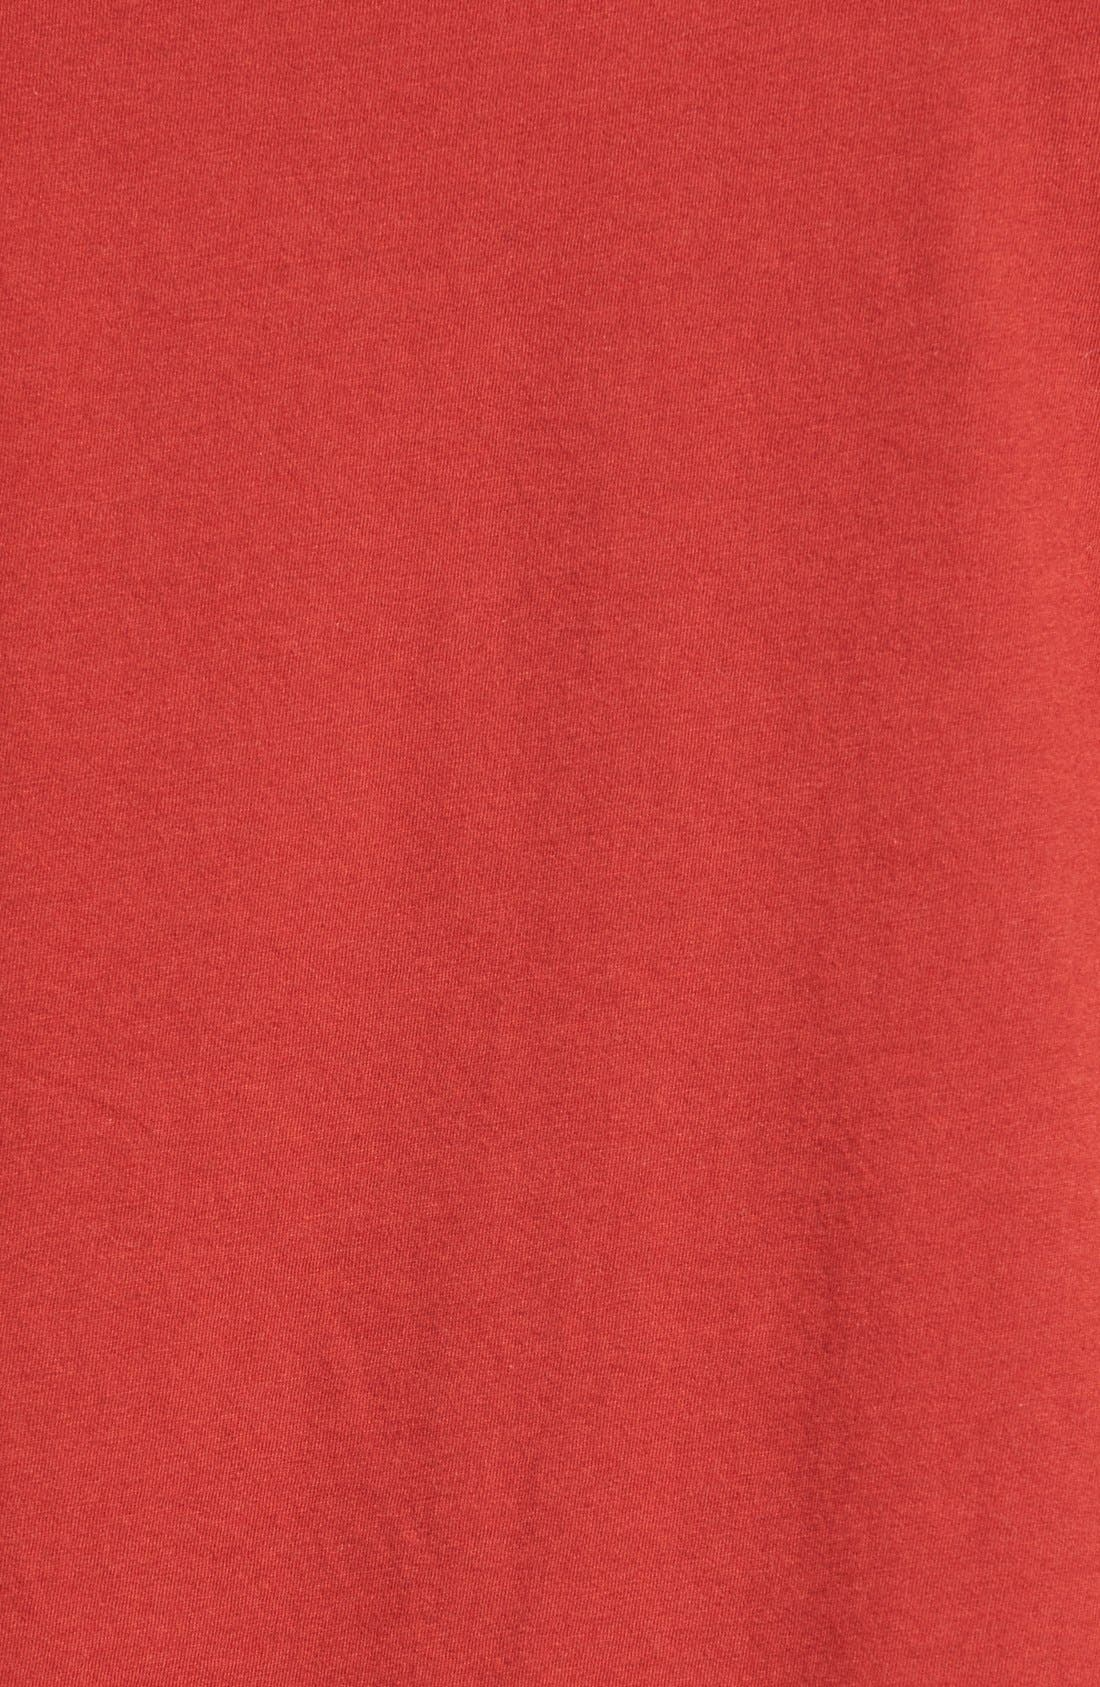 Alternate Image 5  - John Varvatos Star USA 'Faded Star' Graphic Crewneck T-Shirt